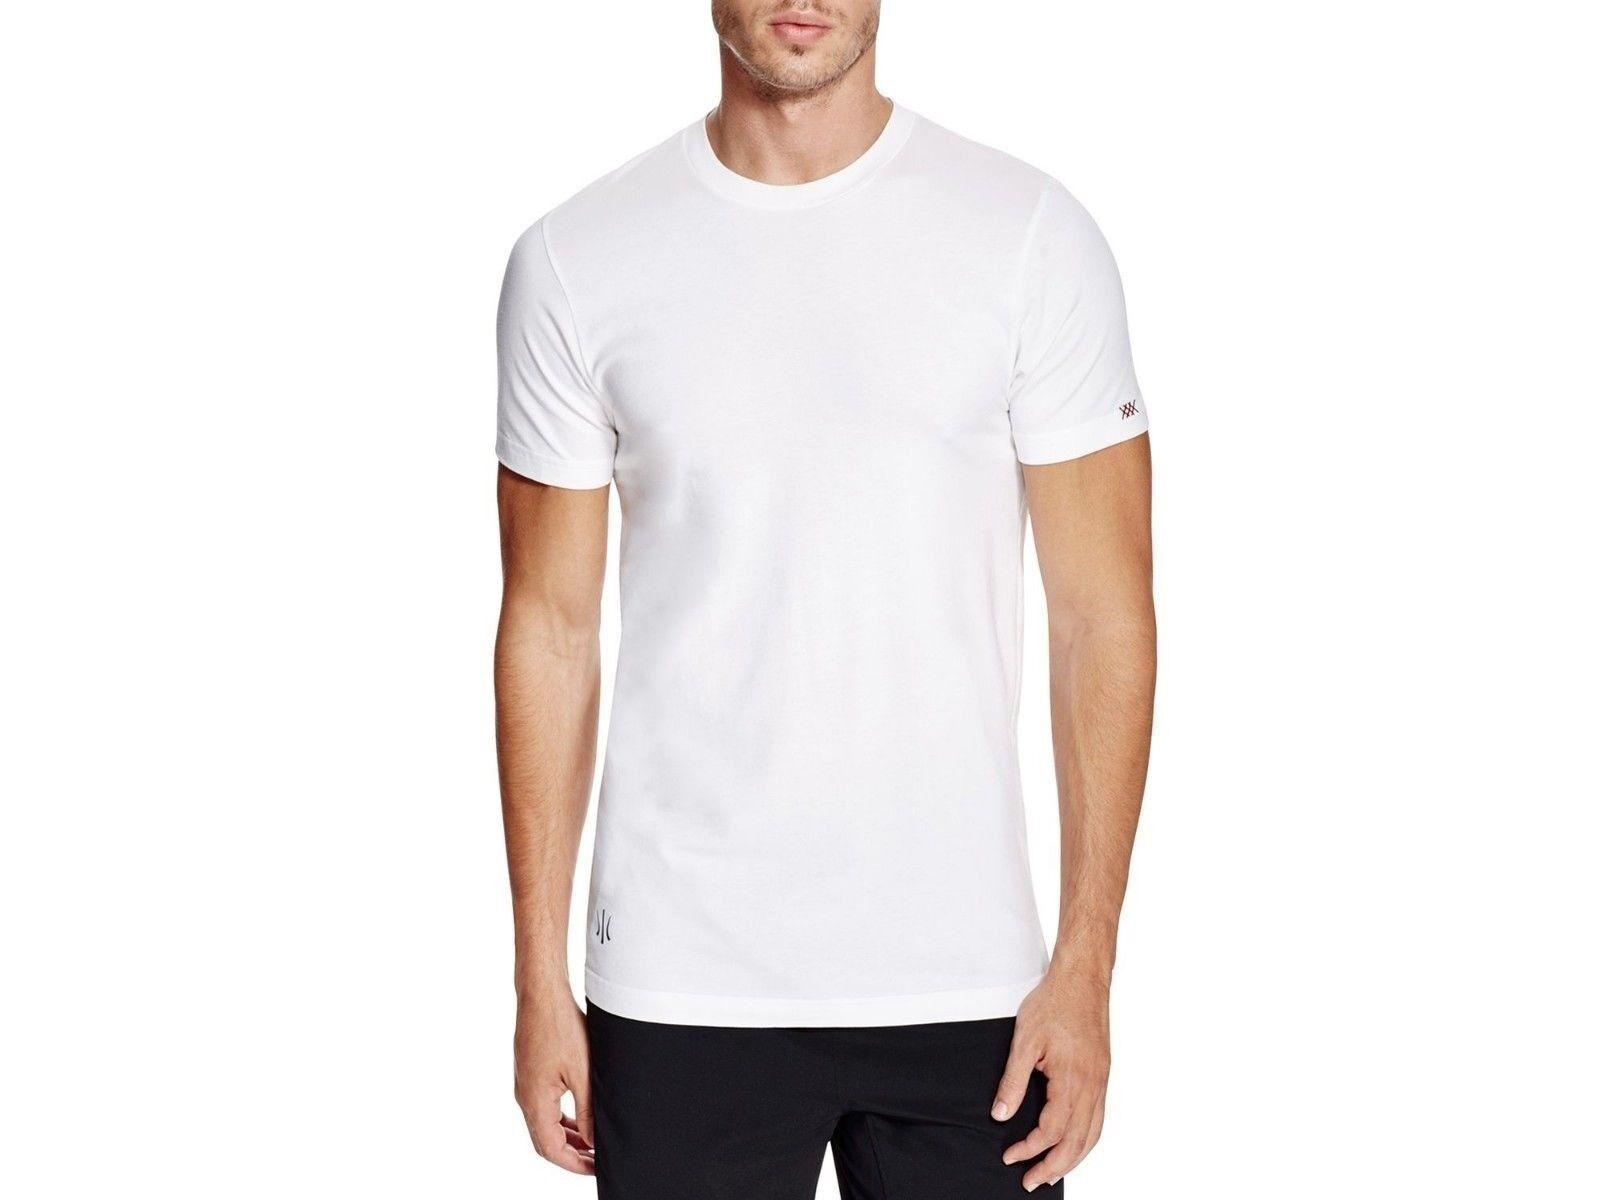 Men's Everyday Pima Cotton T-Shirt White Element Tee NWT Size Small